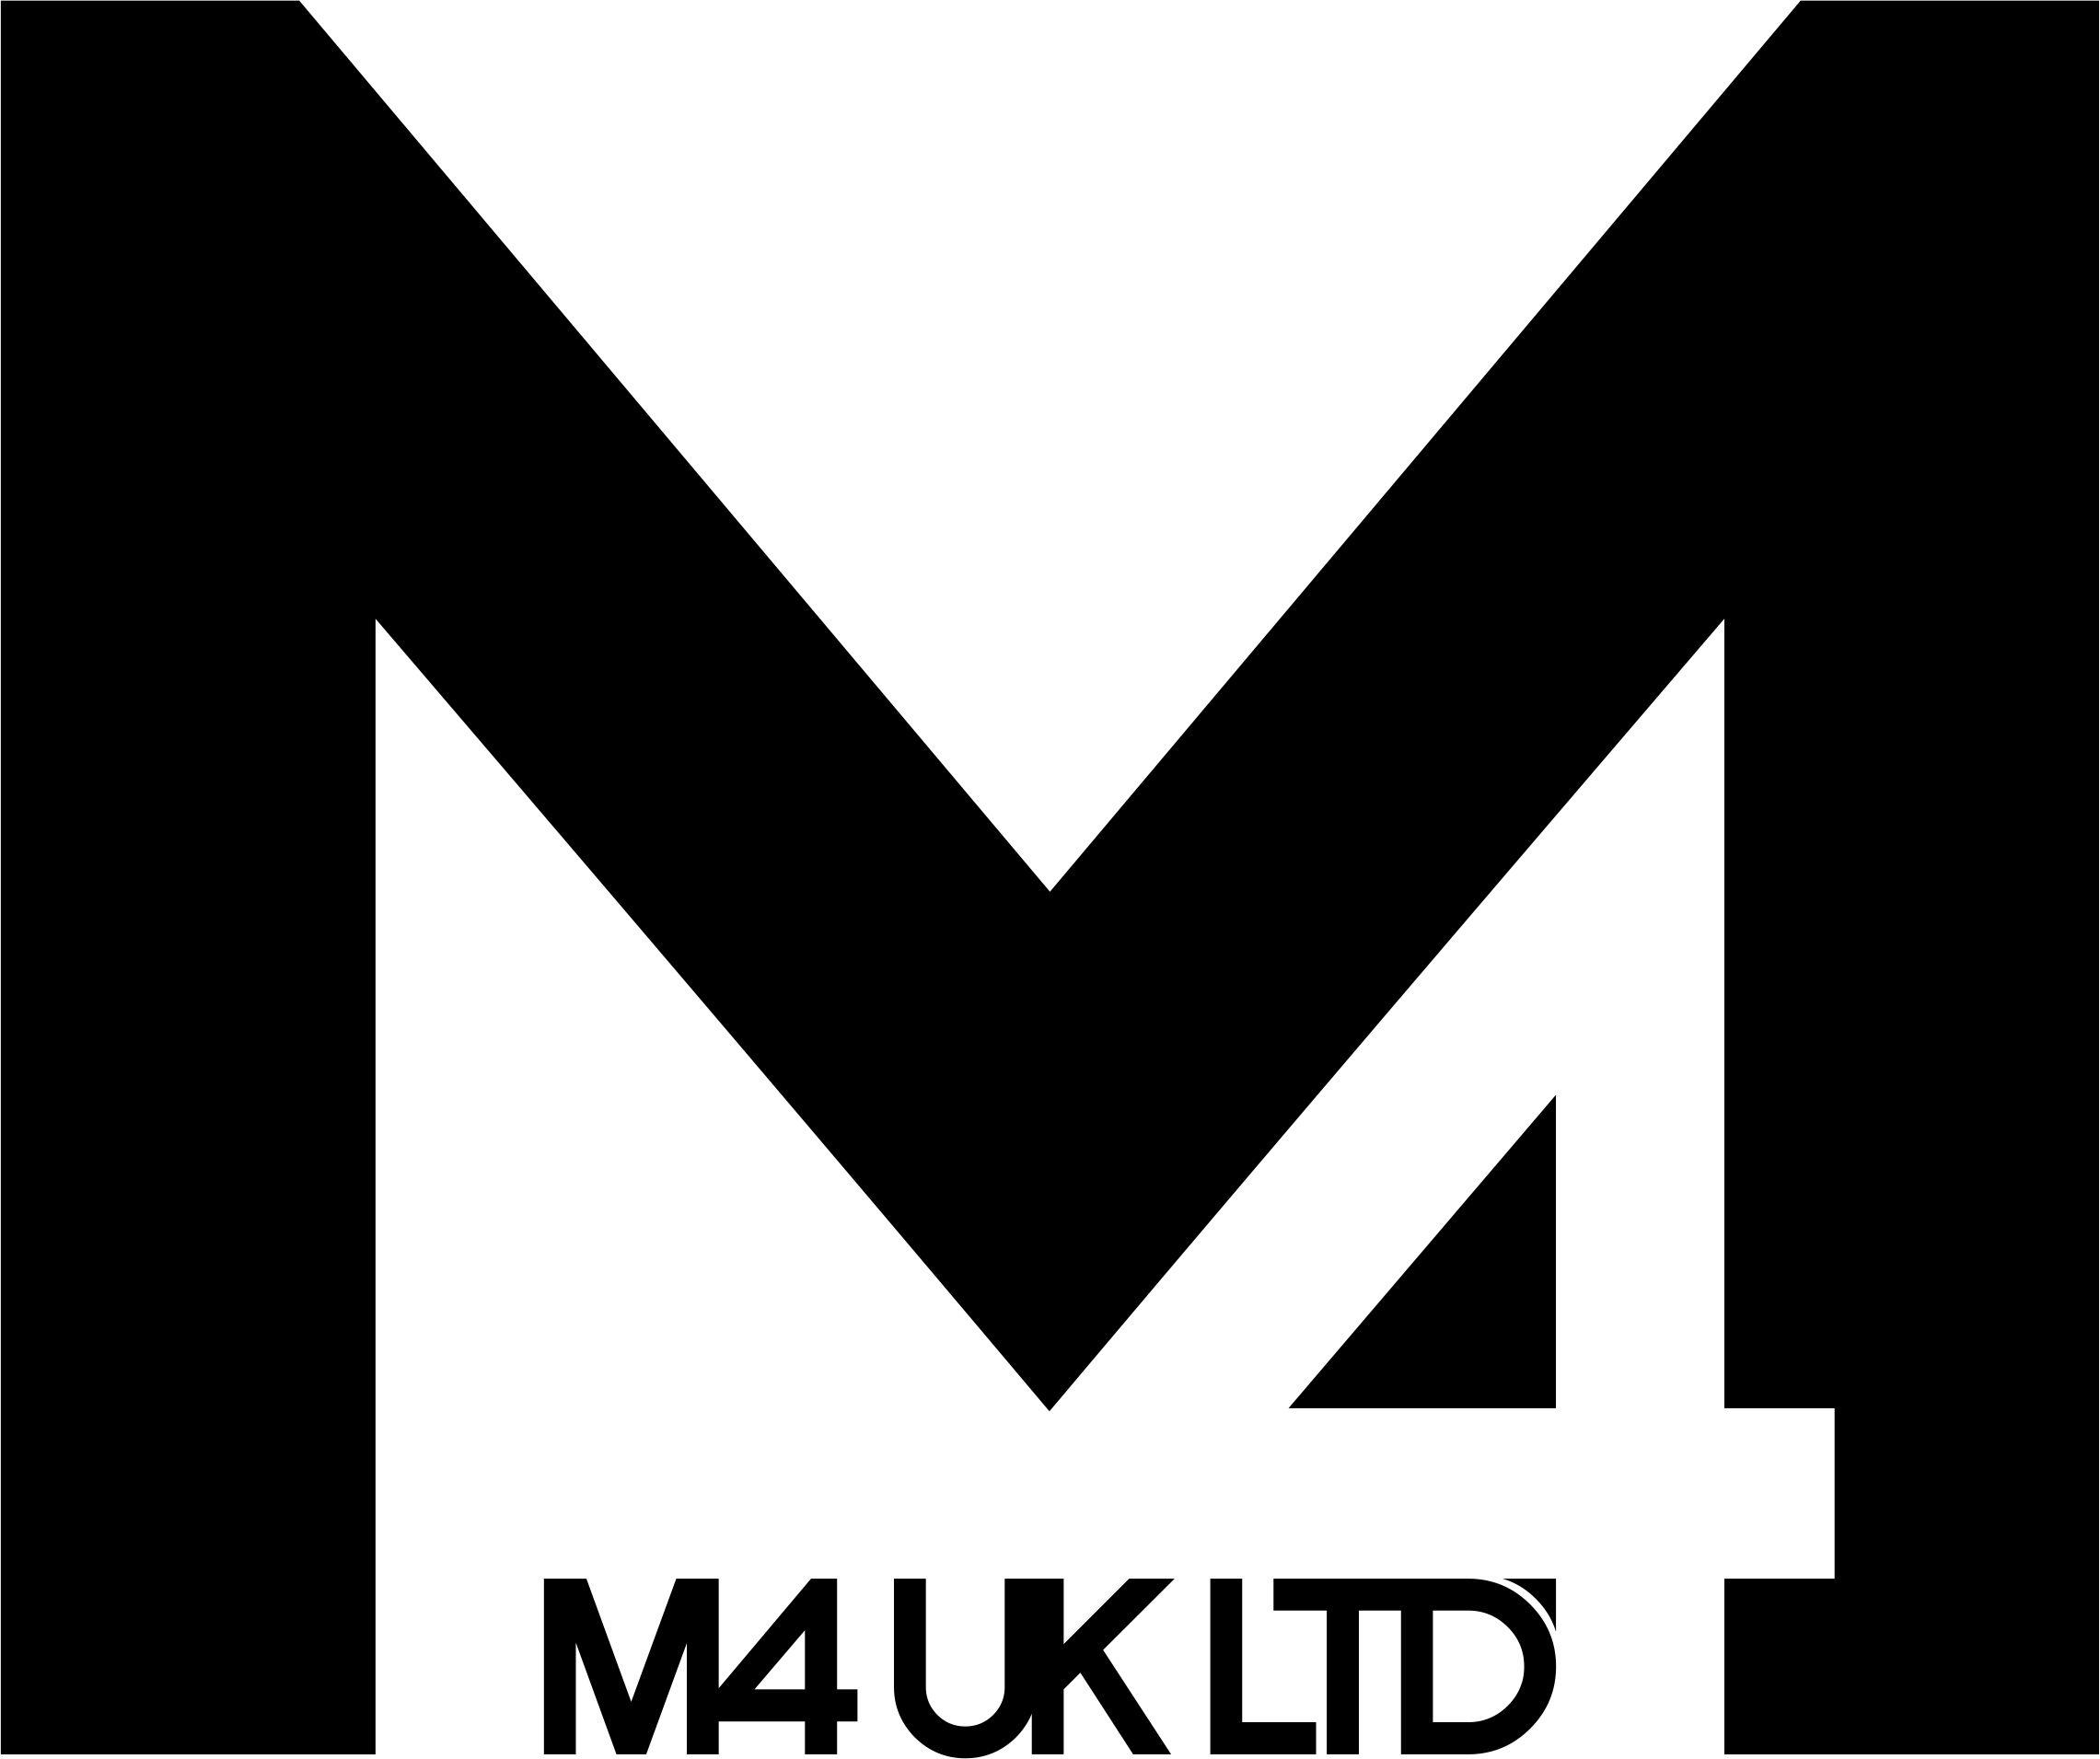 M4 UK Ltd